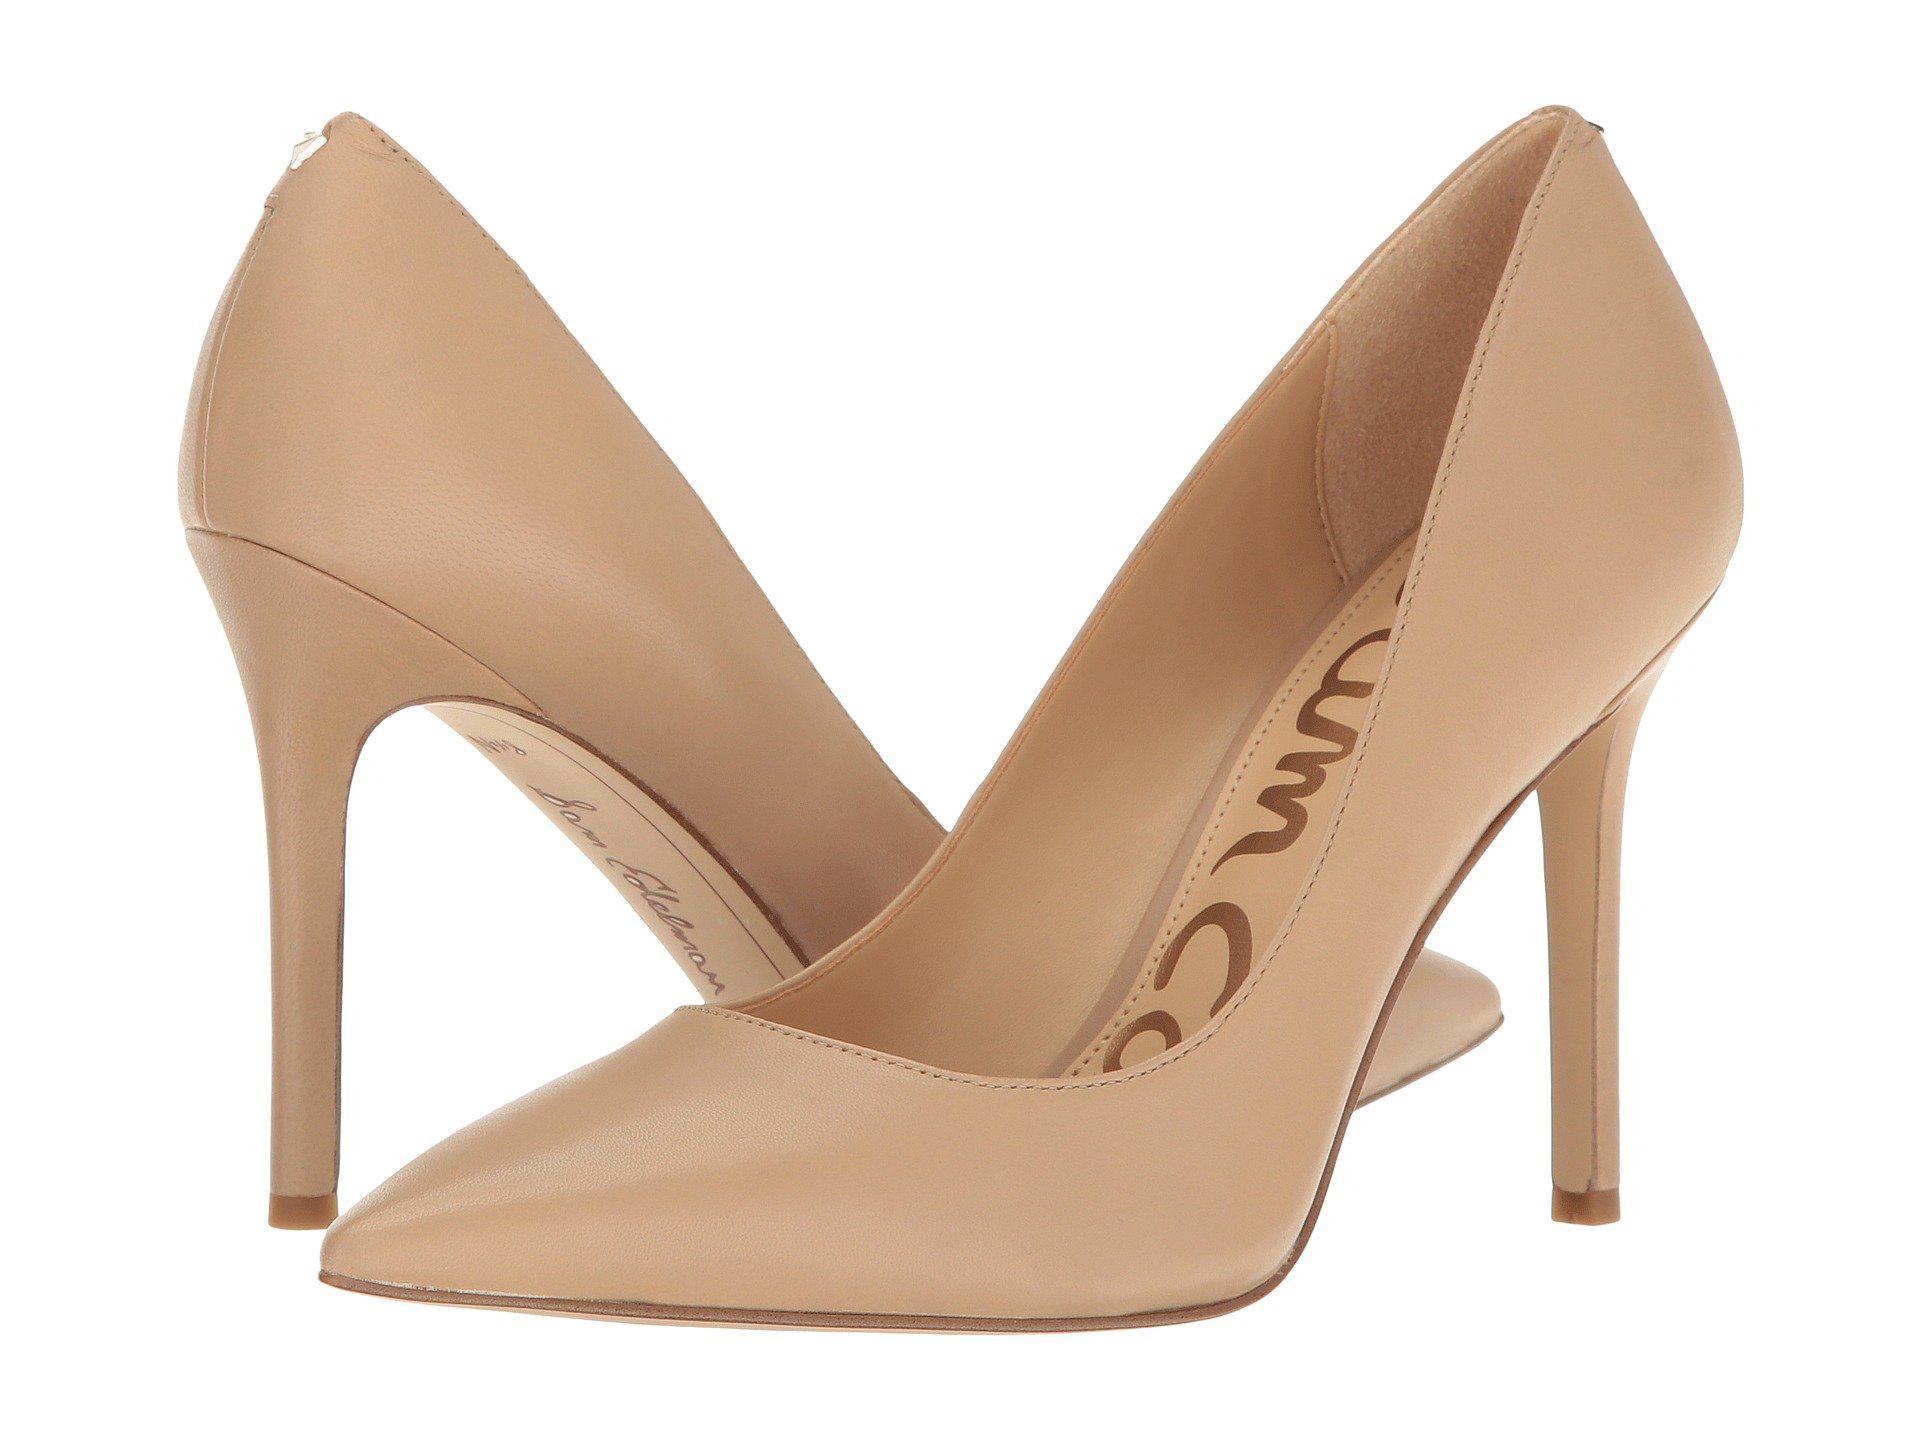 ae378e4cf22b Lyst - Sam Edelman Danna (classic Nude Patent) Women s Shoes in ...